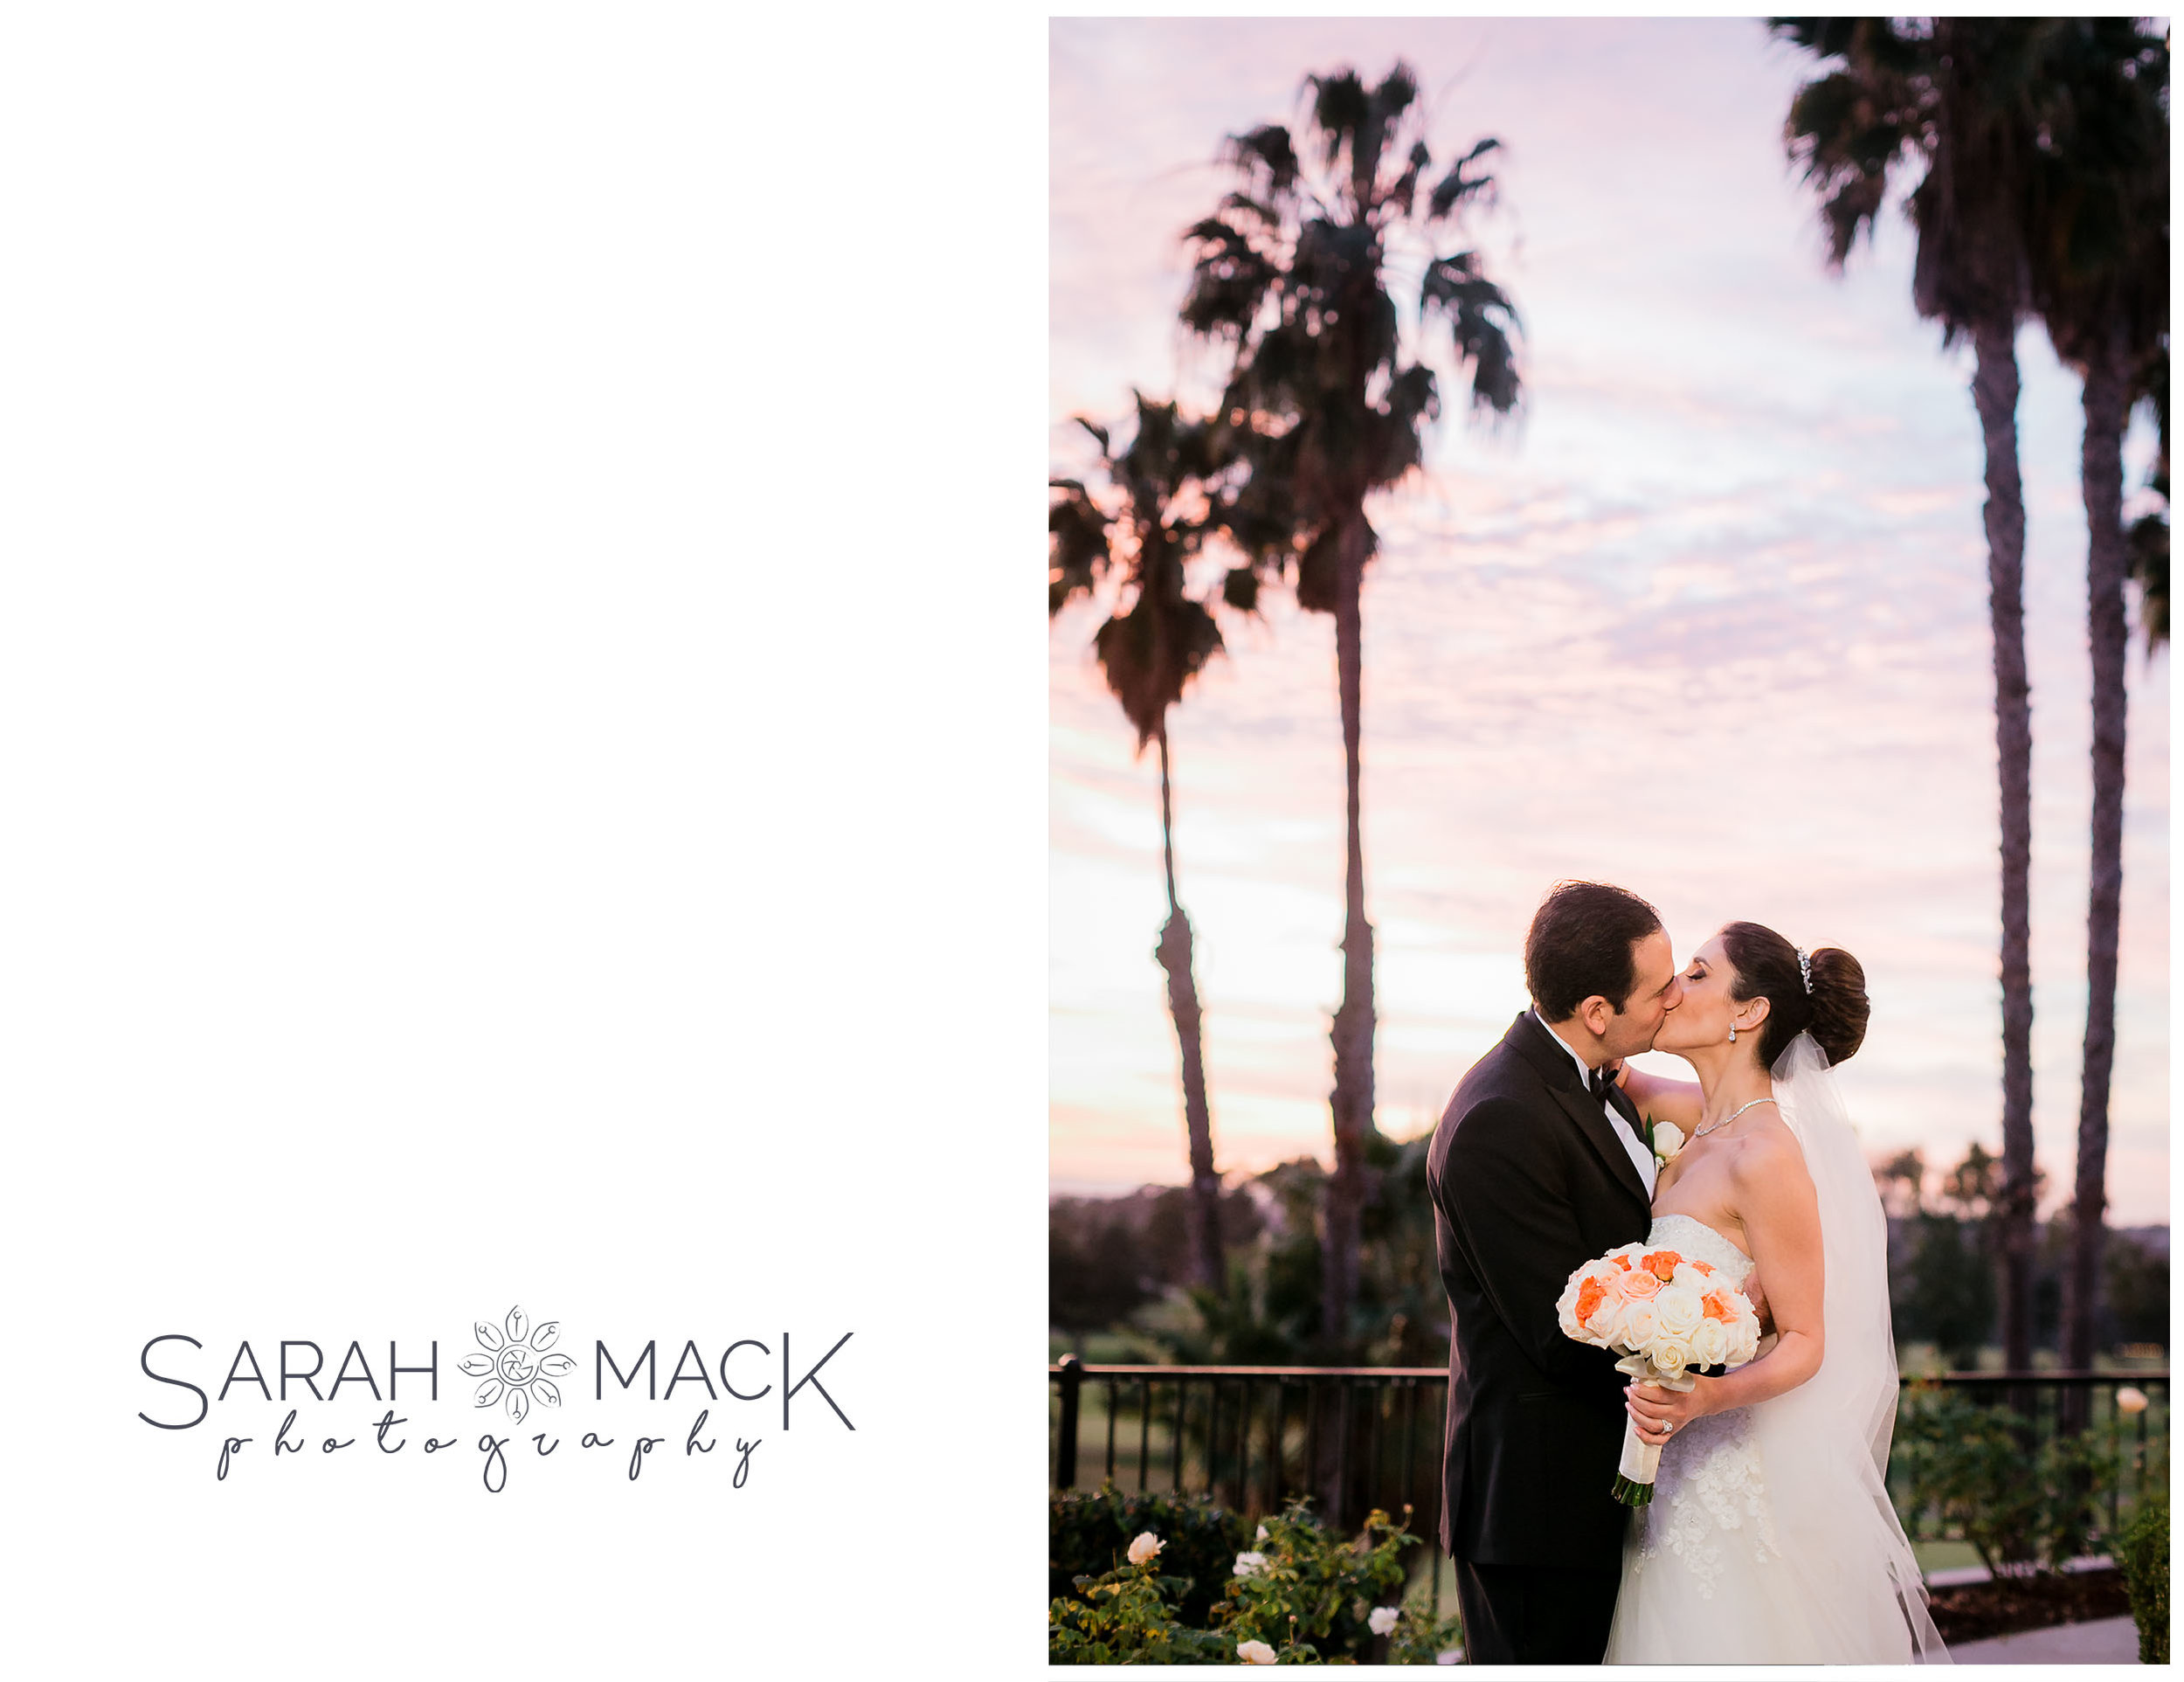 NJ-Newport-Beach-Marriott-Persian-Wedding-34.jpg